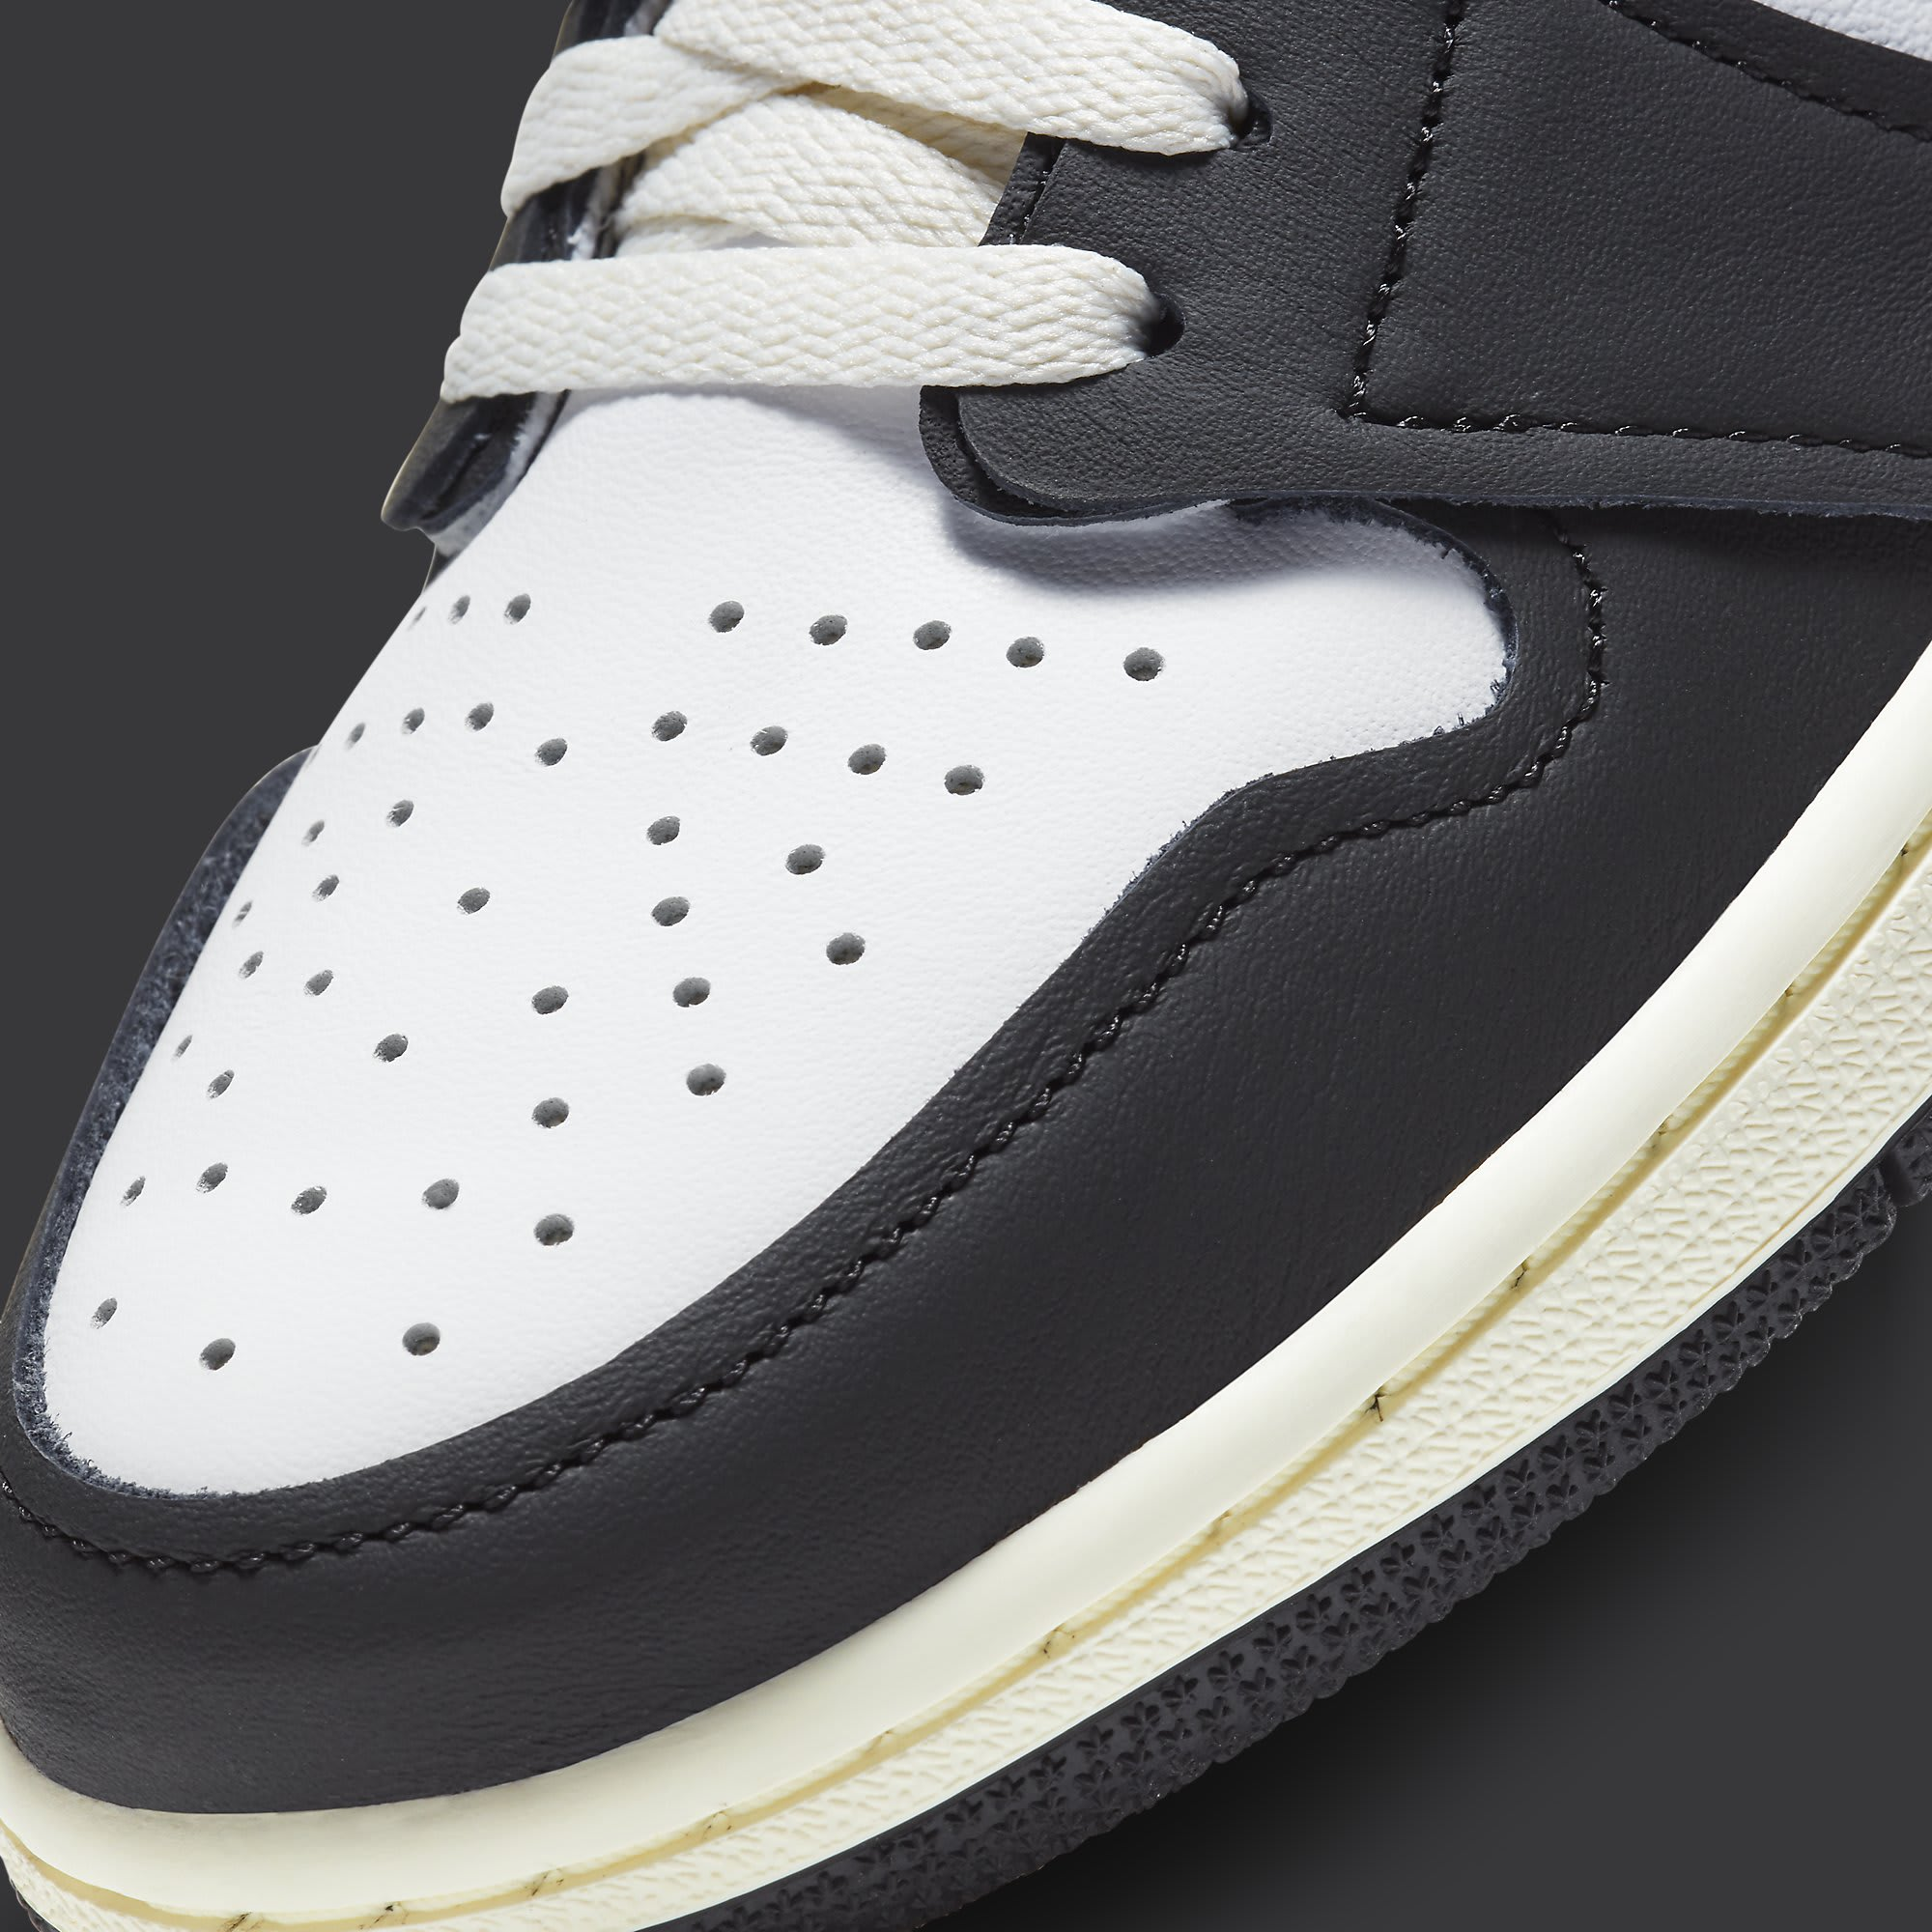 Air Jordan 1 Volt Gold Release Date 555088-118 Toe